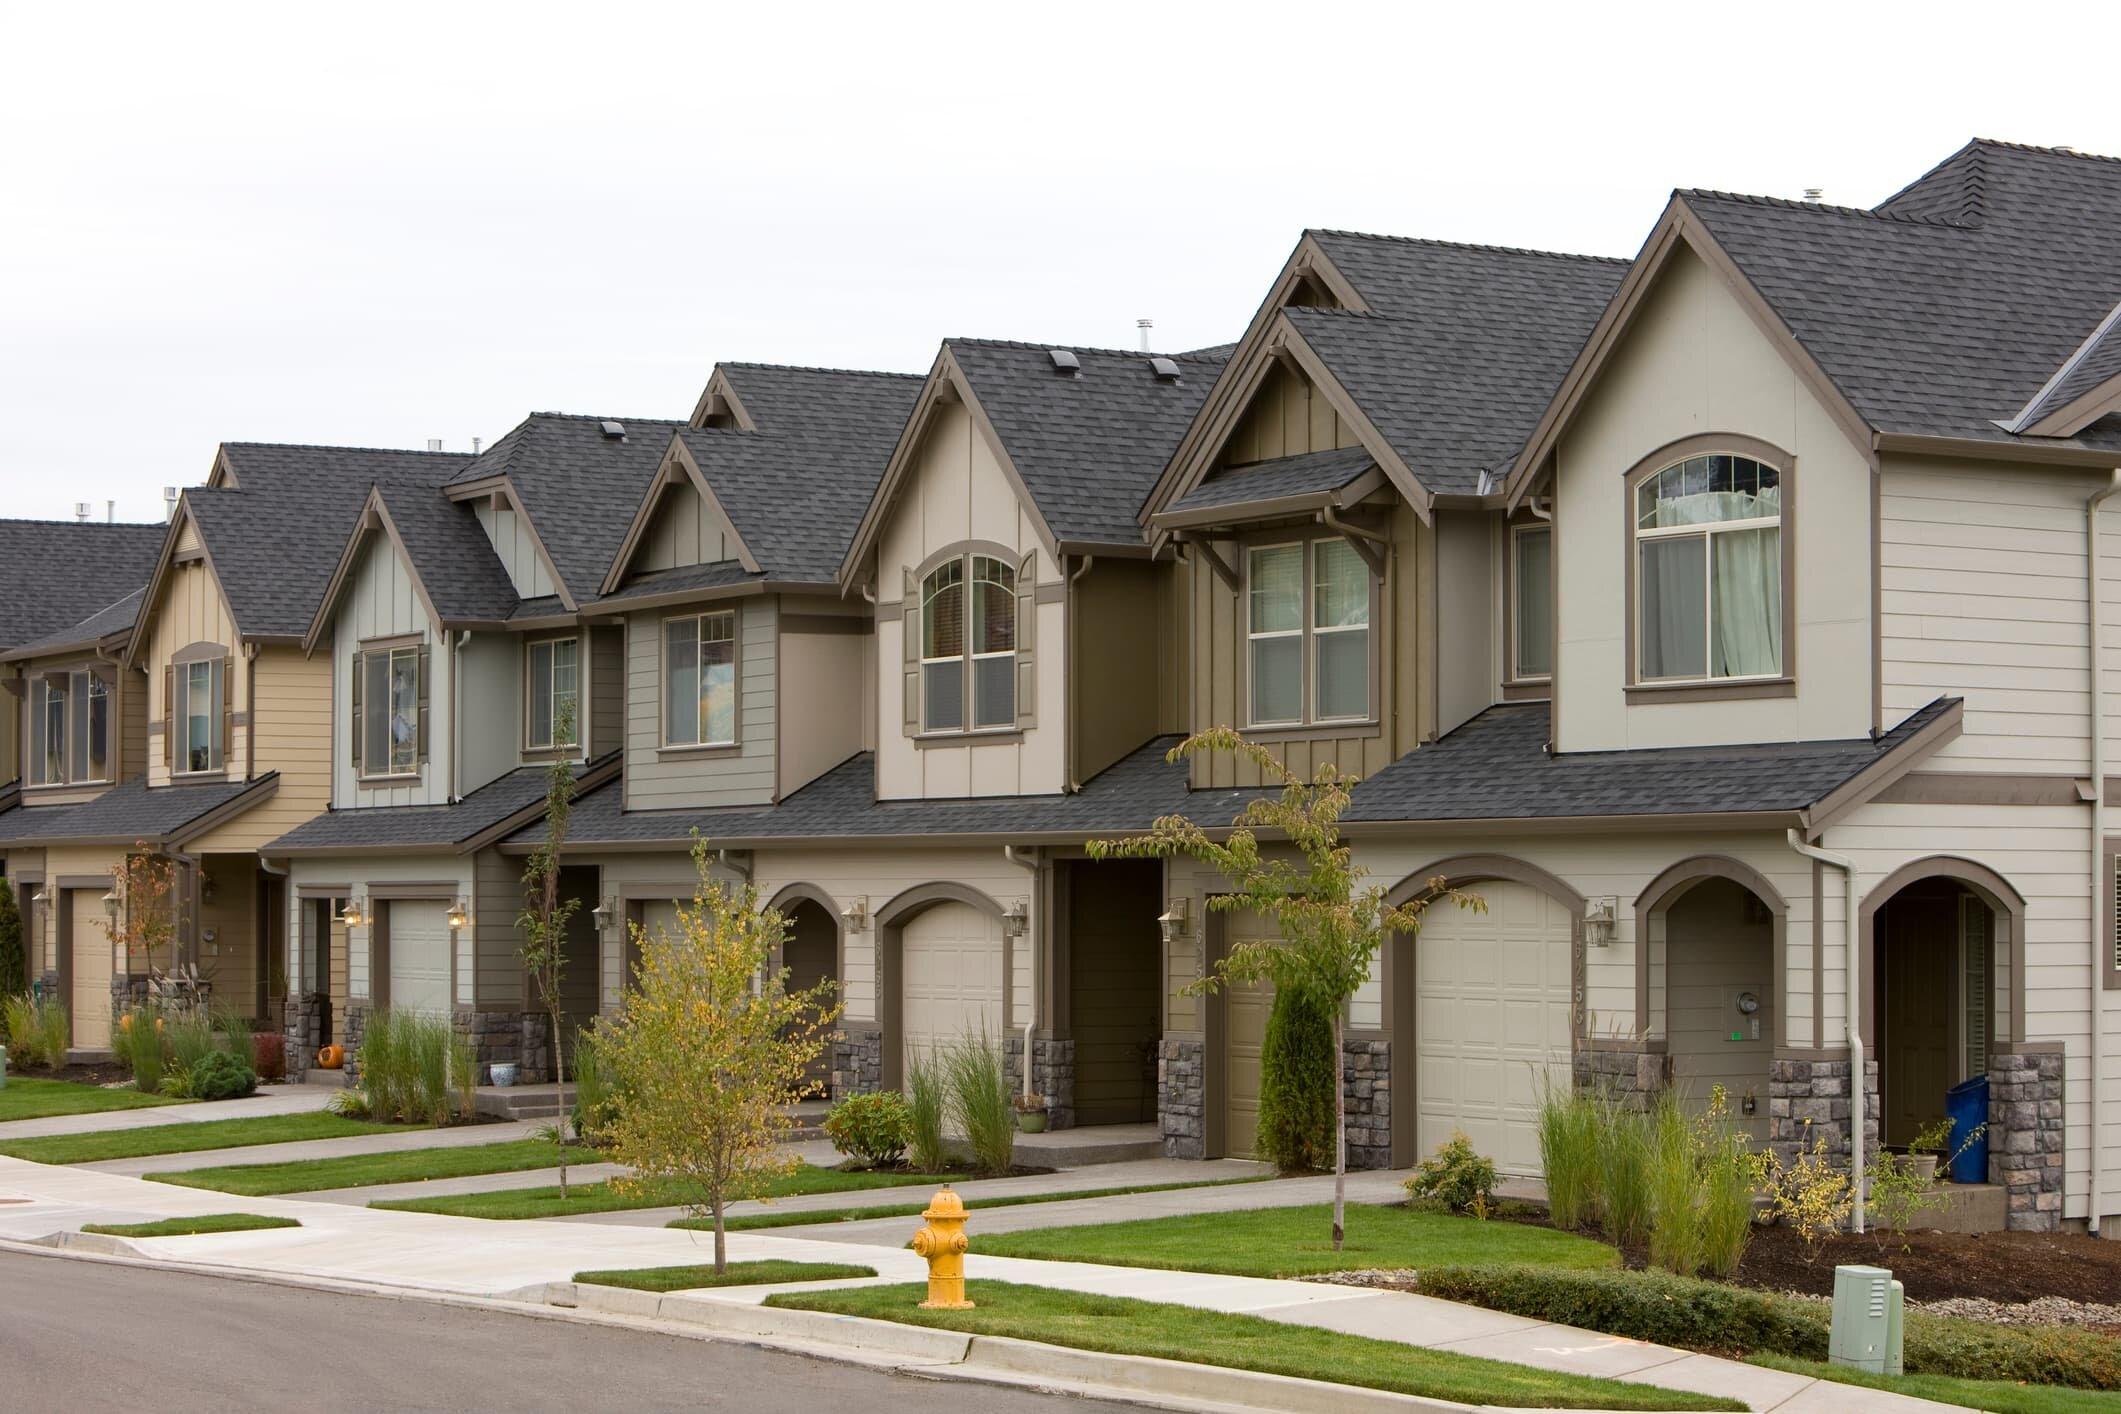 home-remodeling-miami-home-renovations-miami